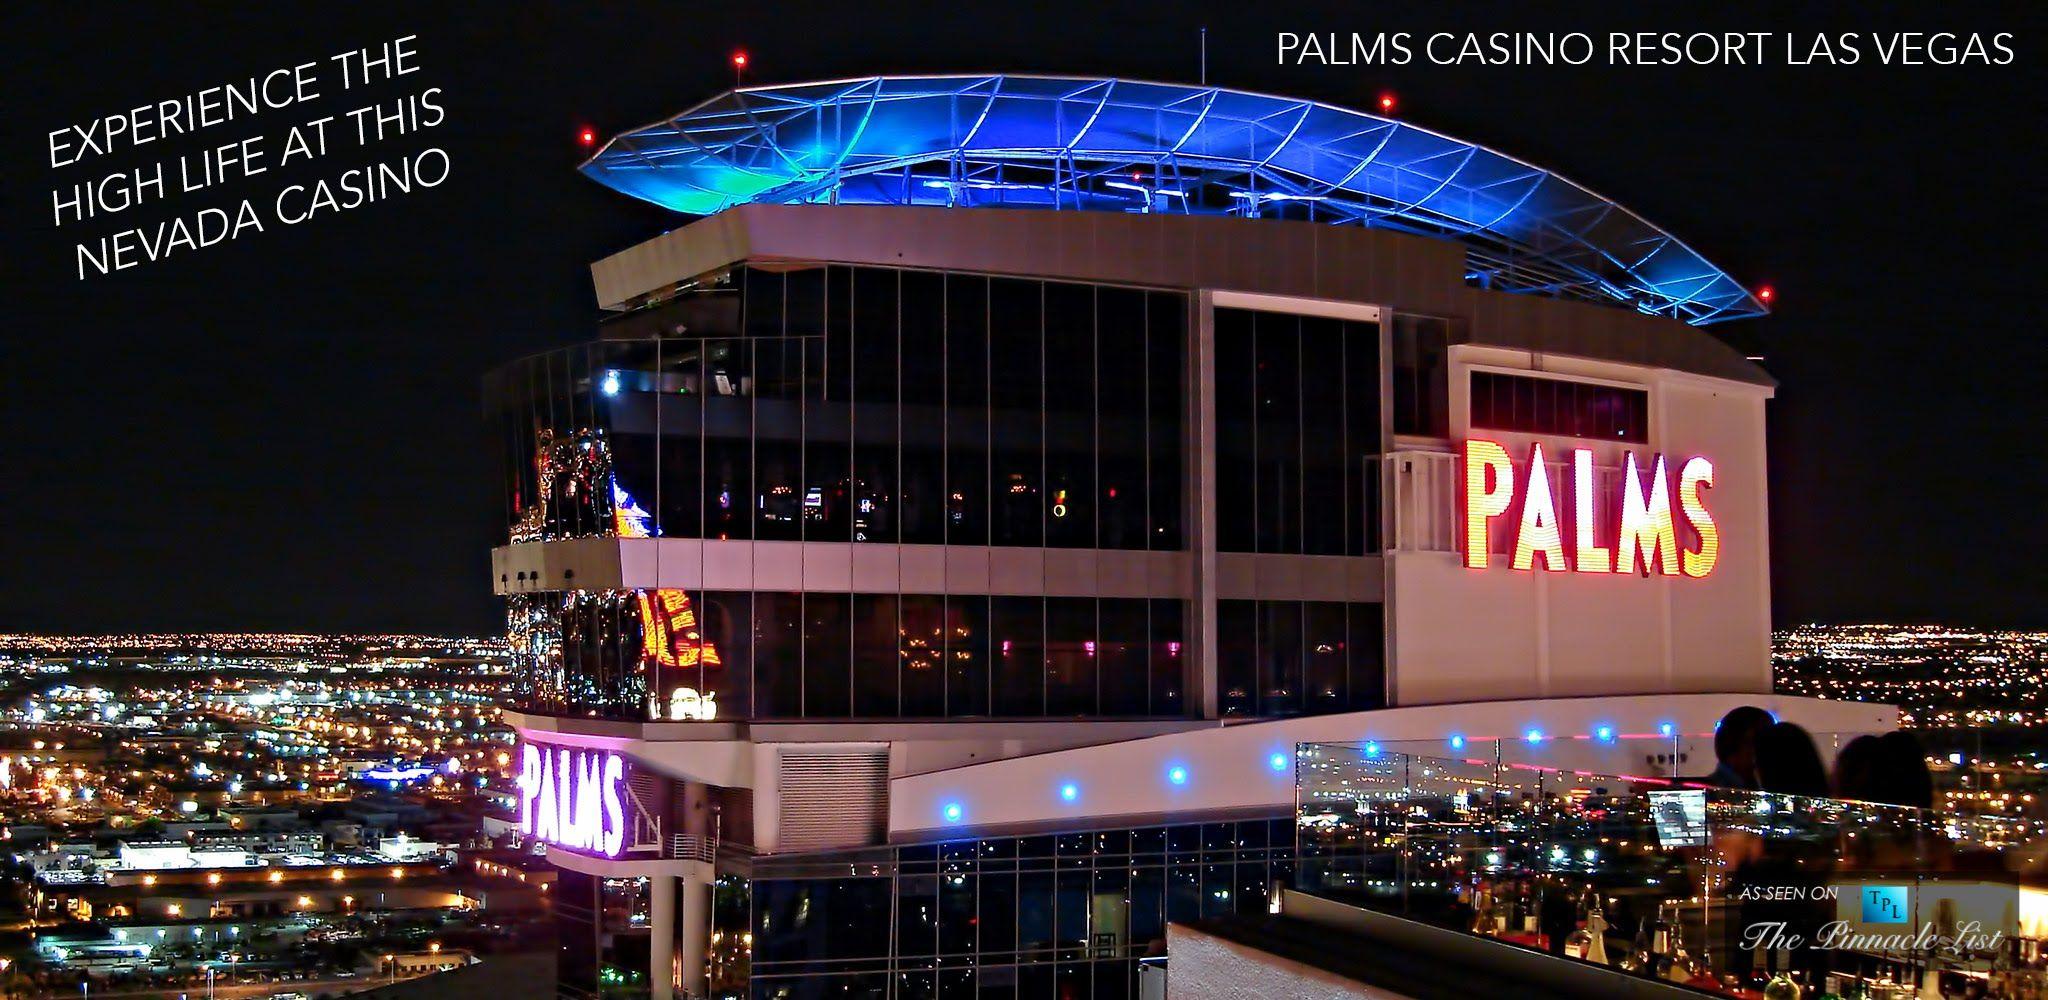 Palms casino and hotel las vegas nevada fable 2 pub games achievements guide